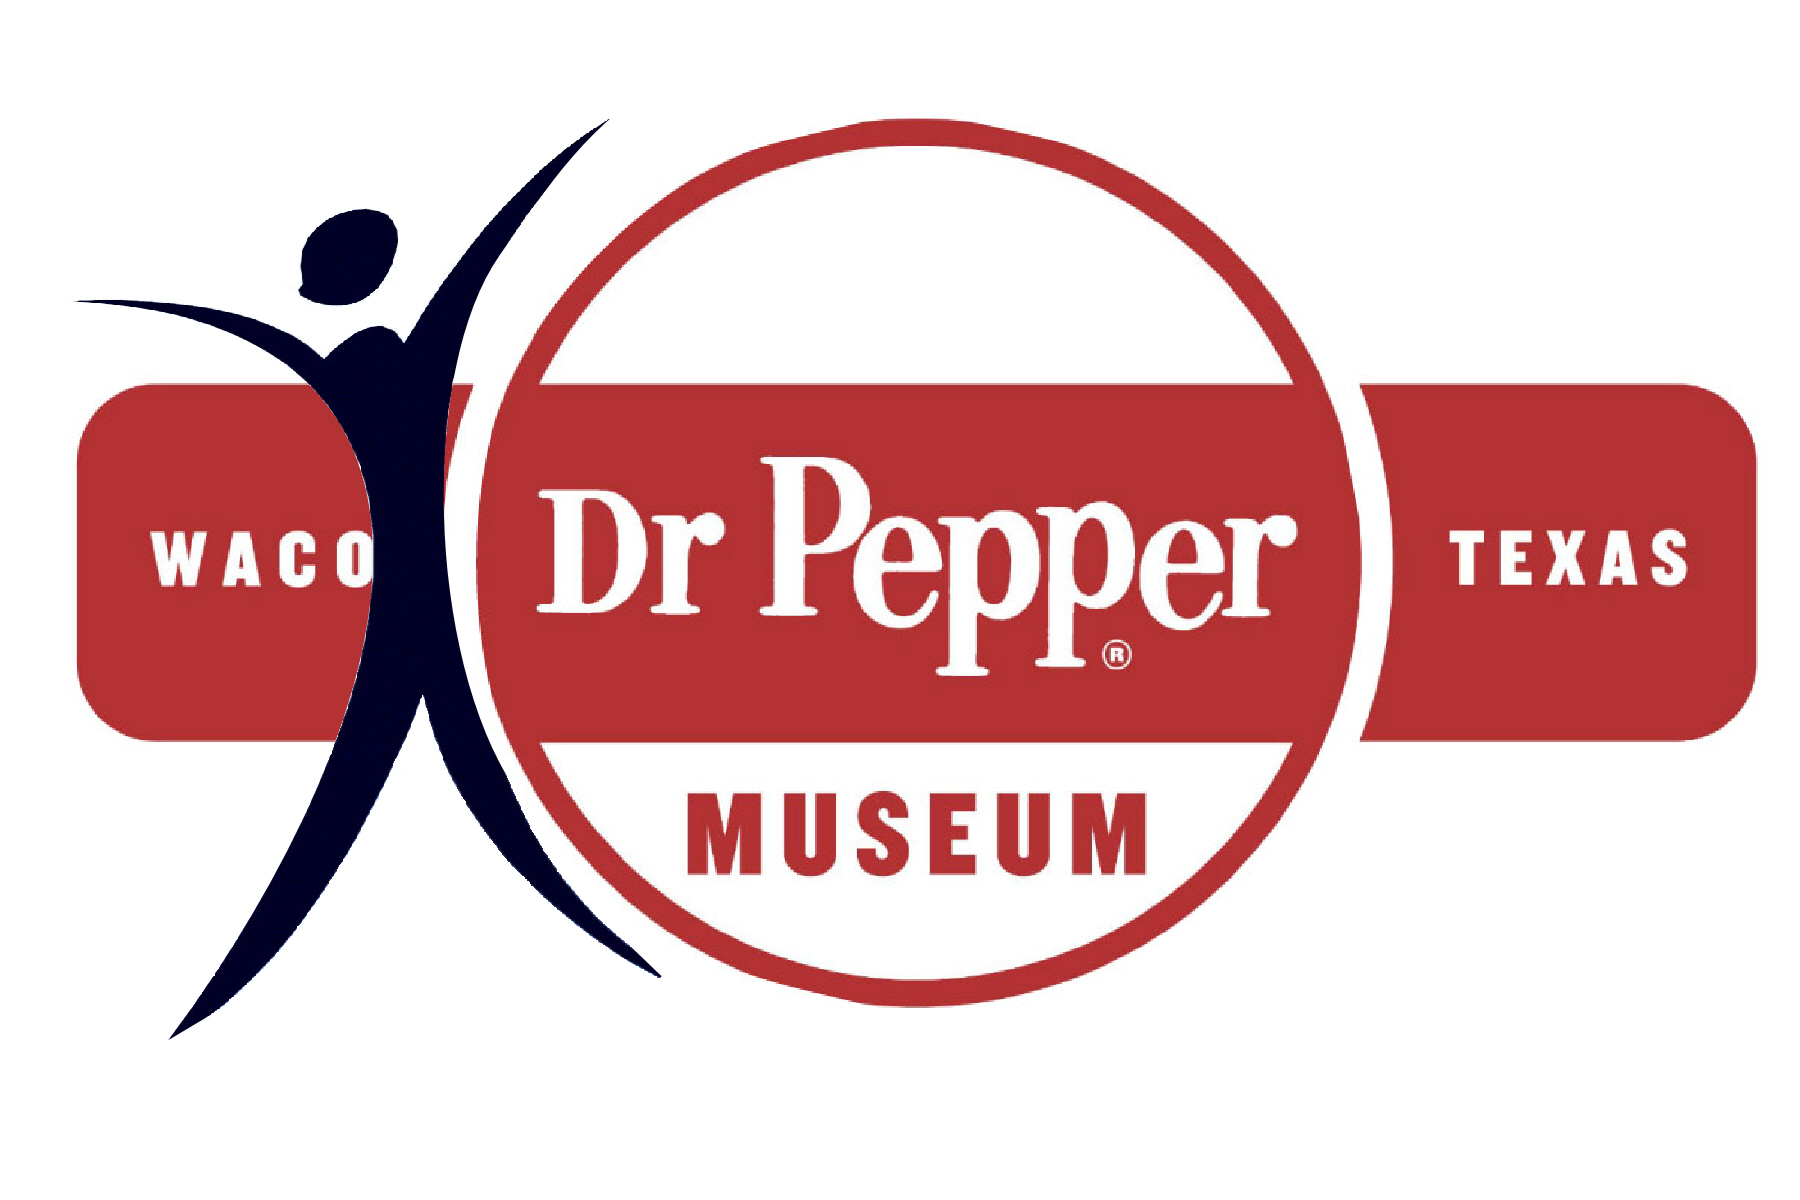 Dr Pepper Museum Free Enterprise Institute Field Trips